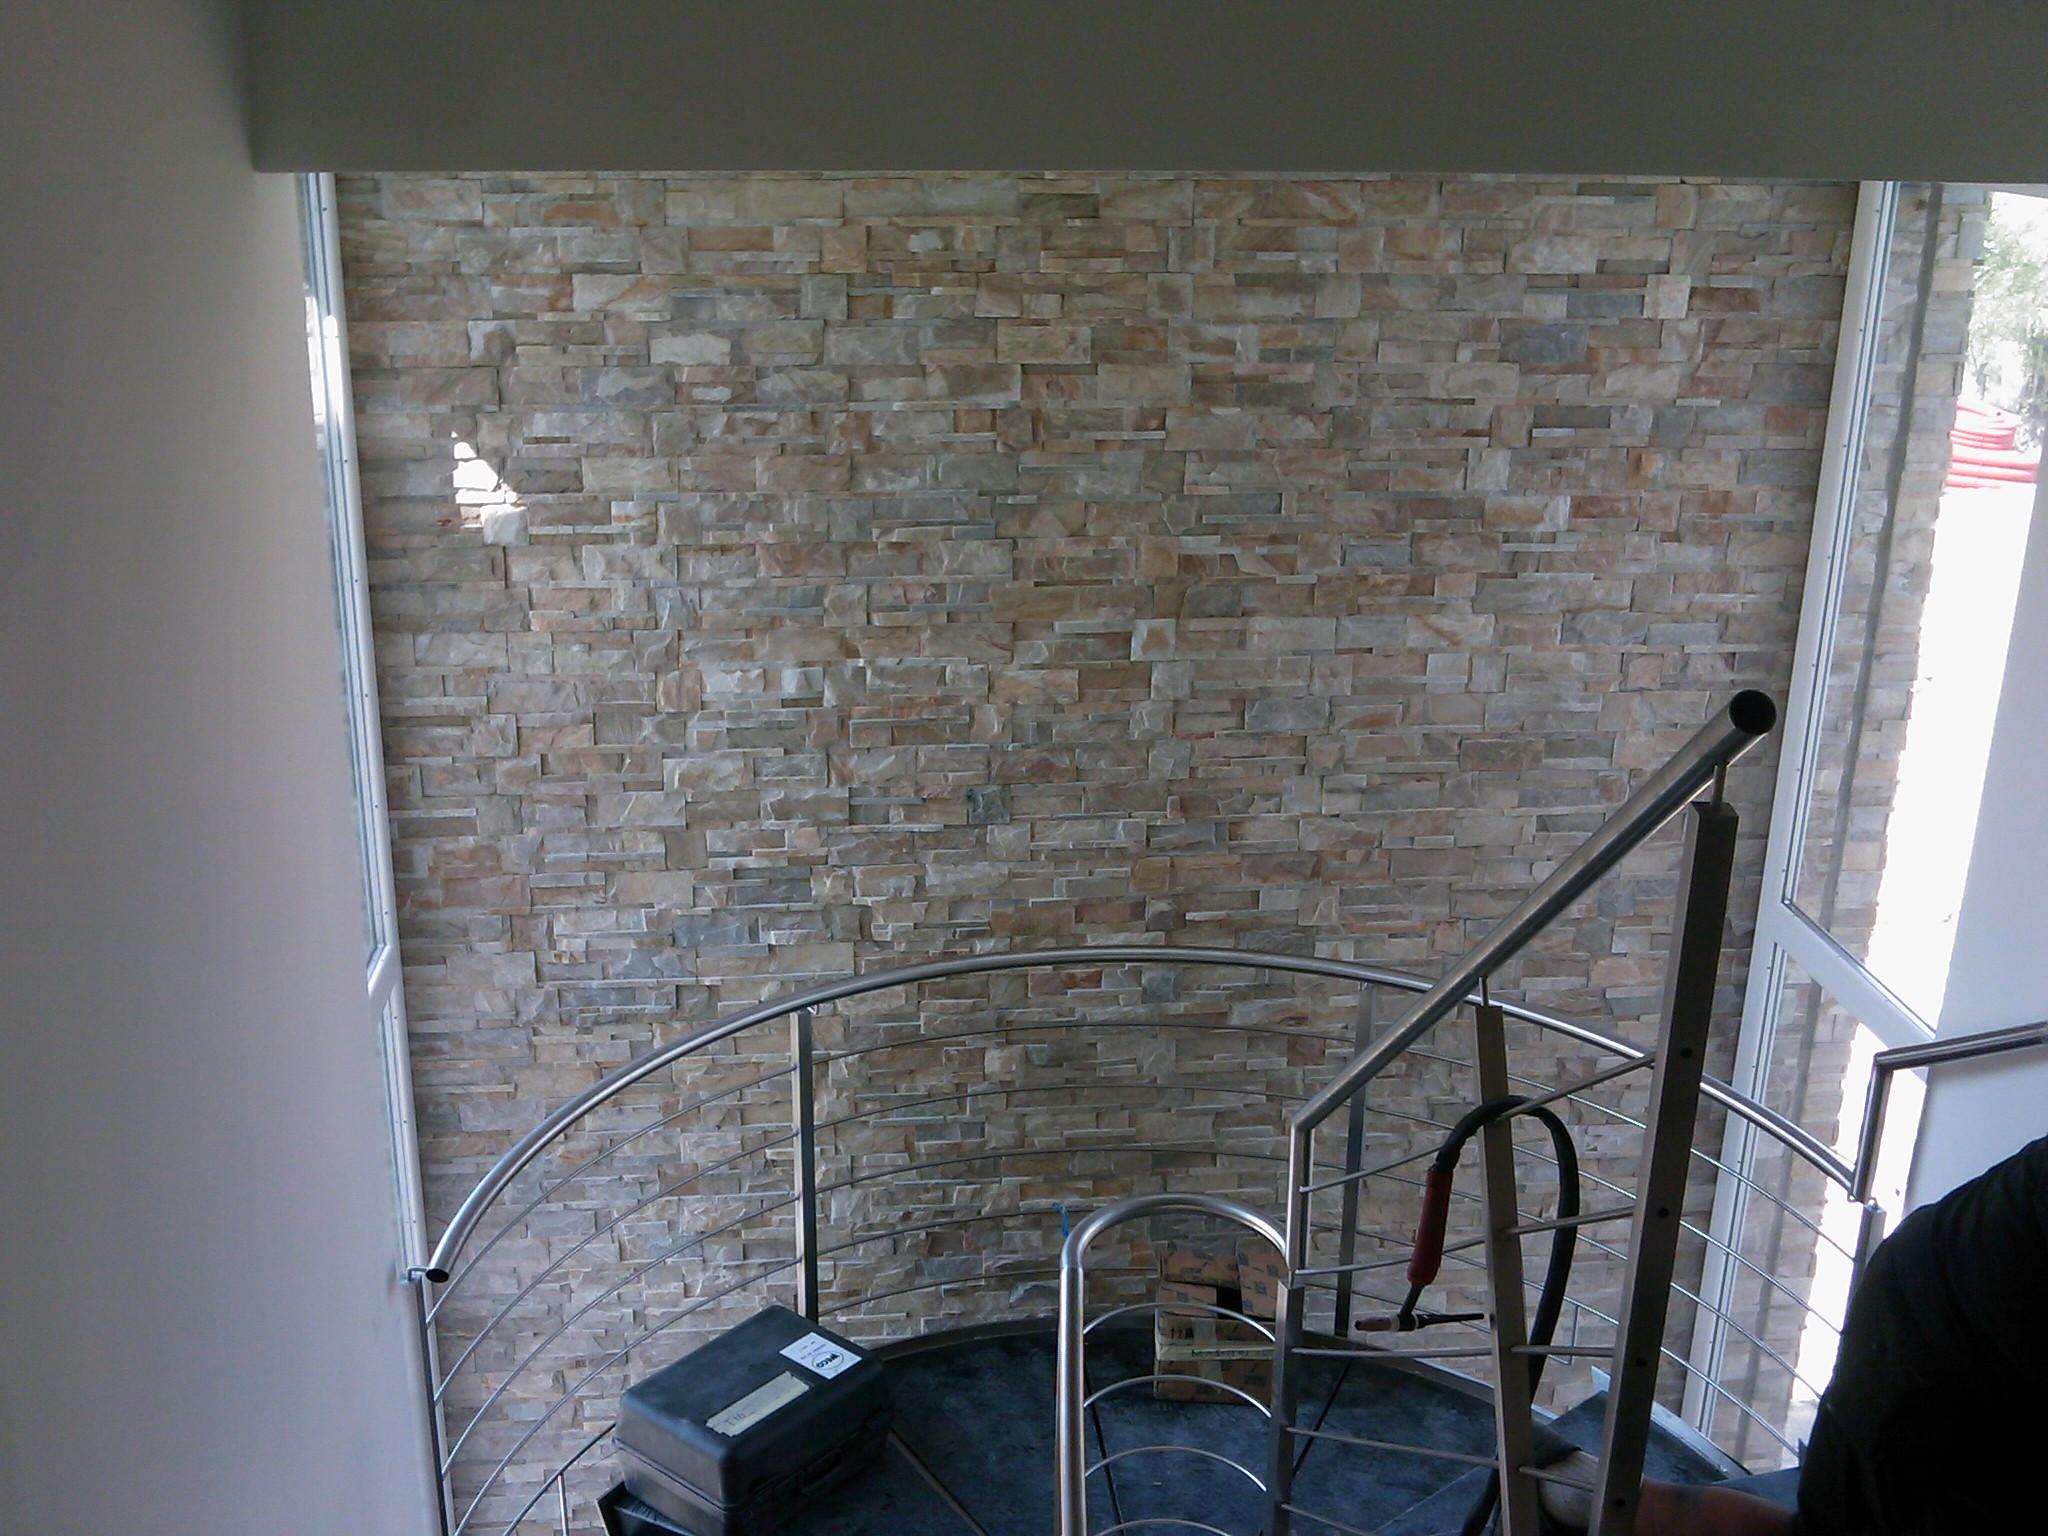 Novit rivestimento parete in quarzite naturale - Rivestimento parete interna ...